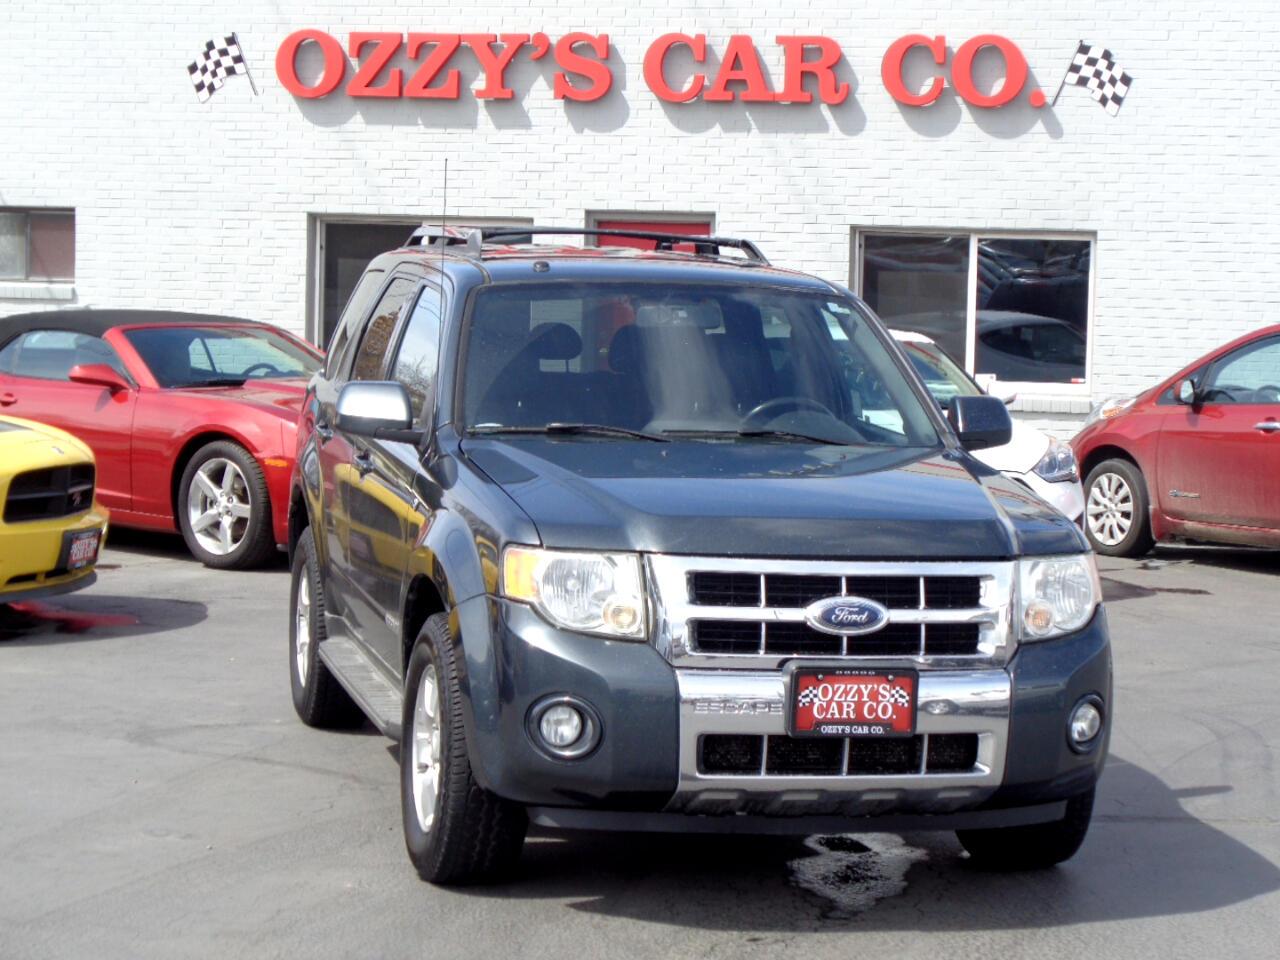 2008 Ford Escape 4WD 4dr V6 Auto Limited